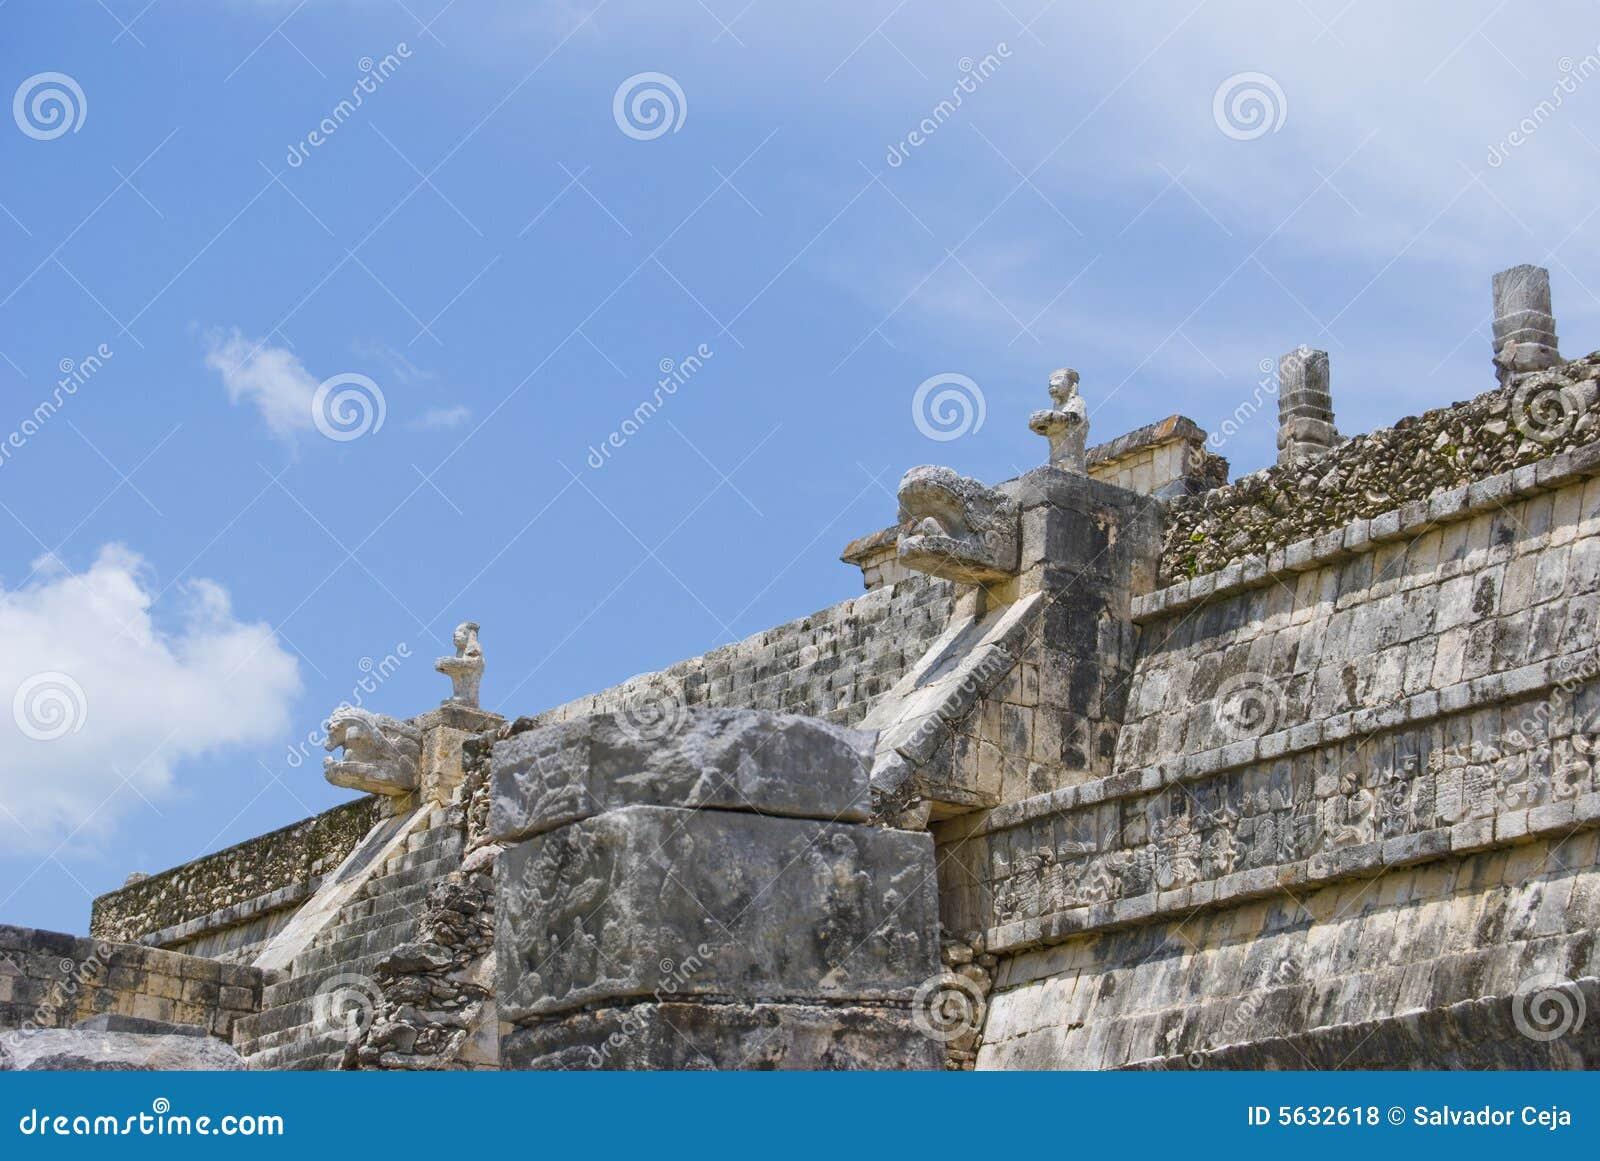 Columnata de Chichen Itza